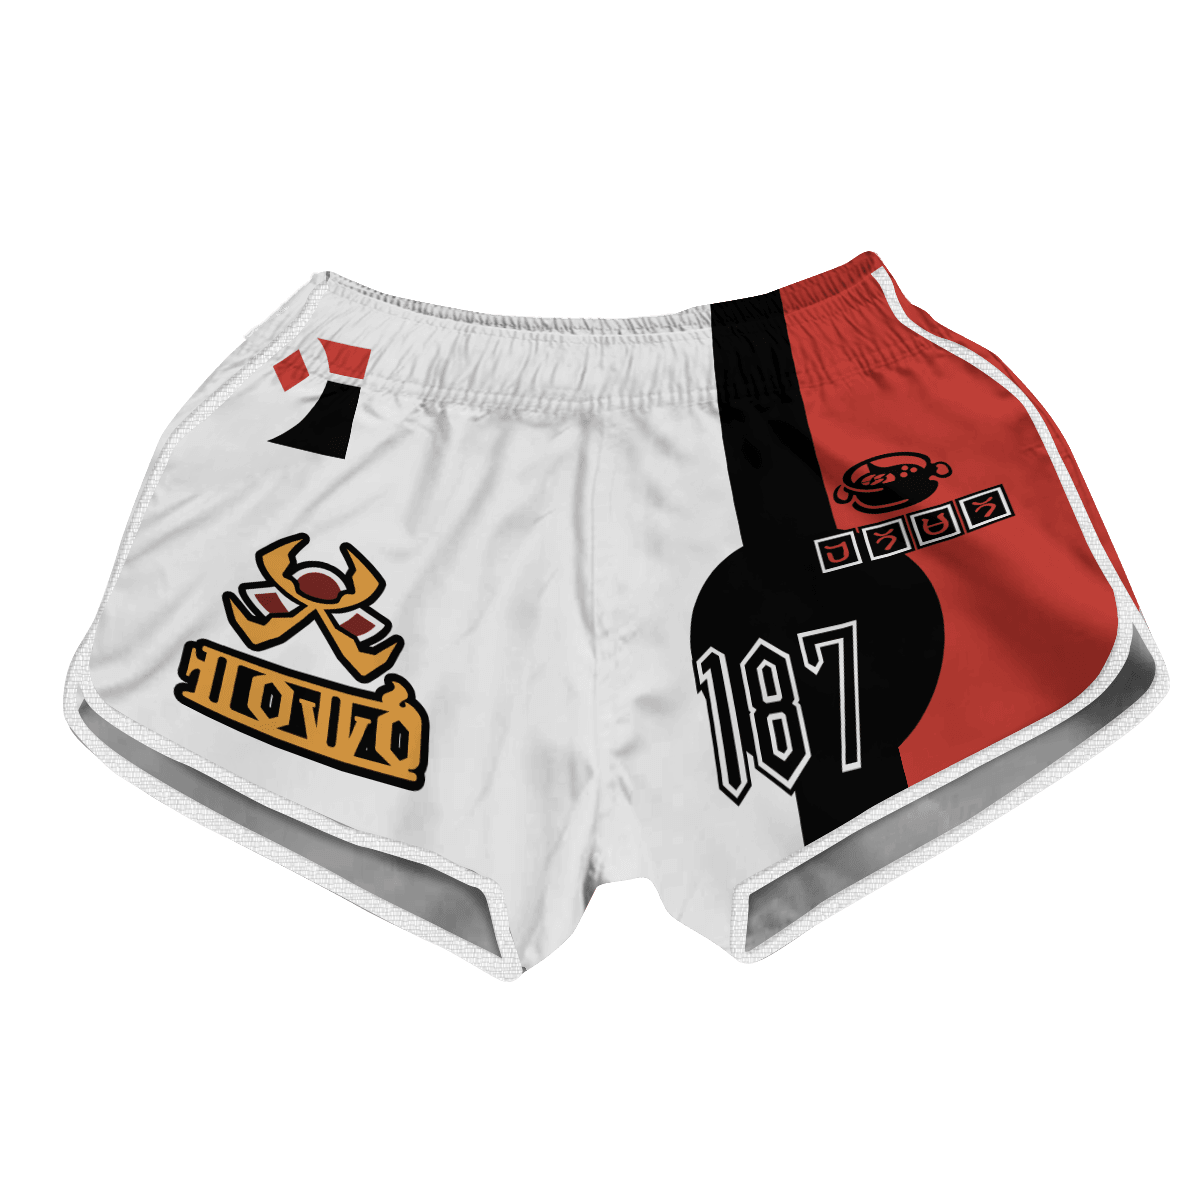 Pokemon Fire Uniform Women Beach Shorts FDM3107 XS Official Anime Swimsuit Merch